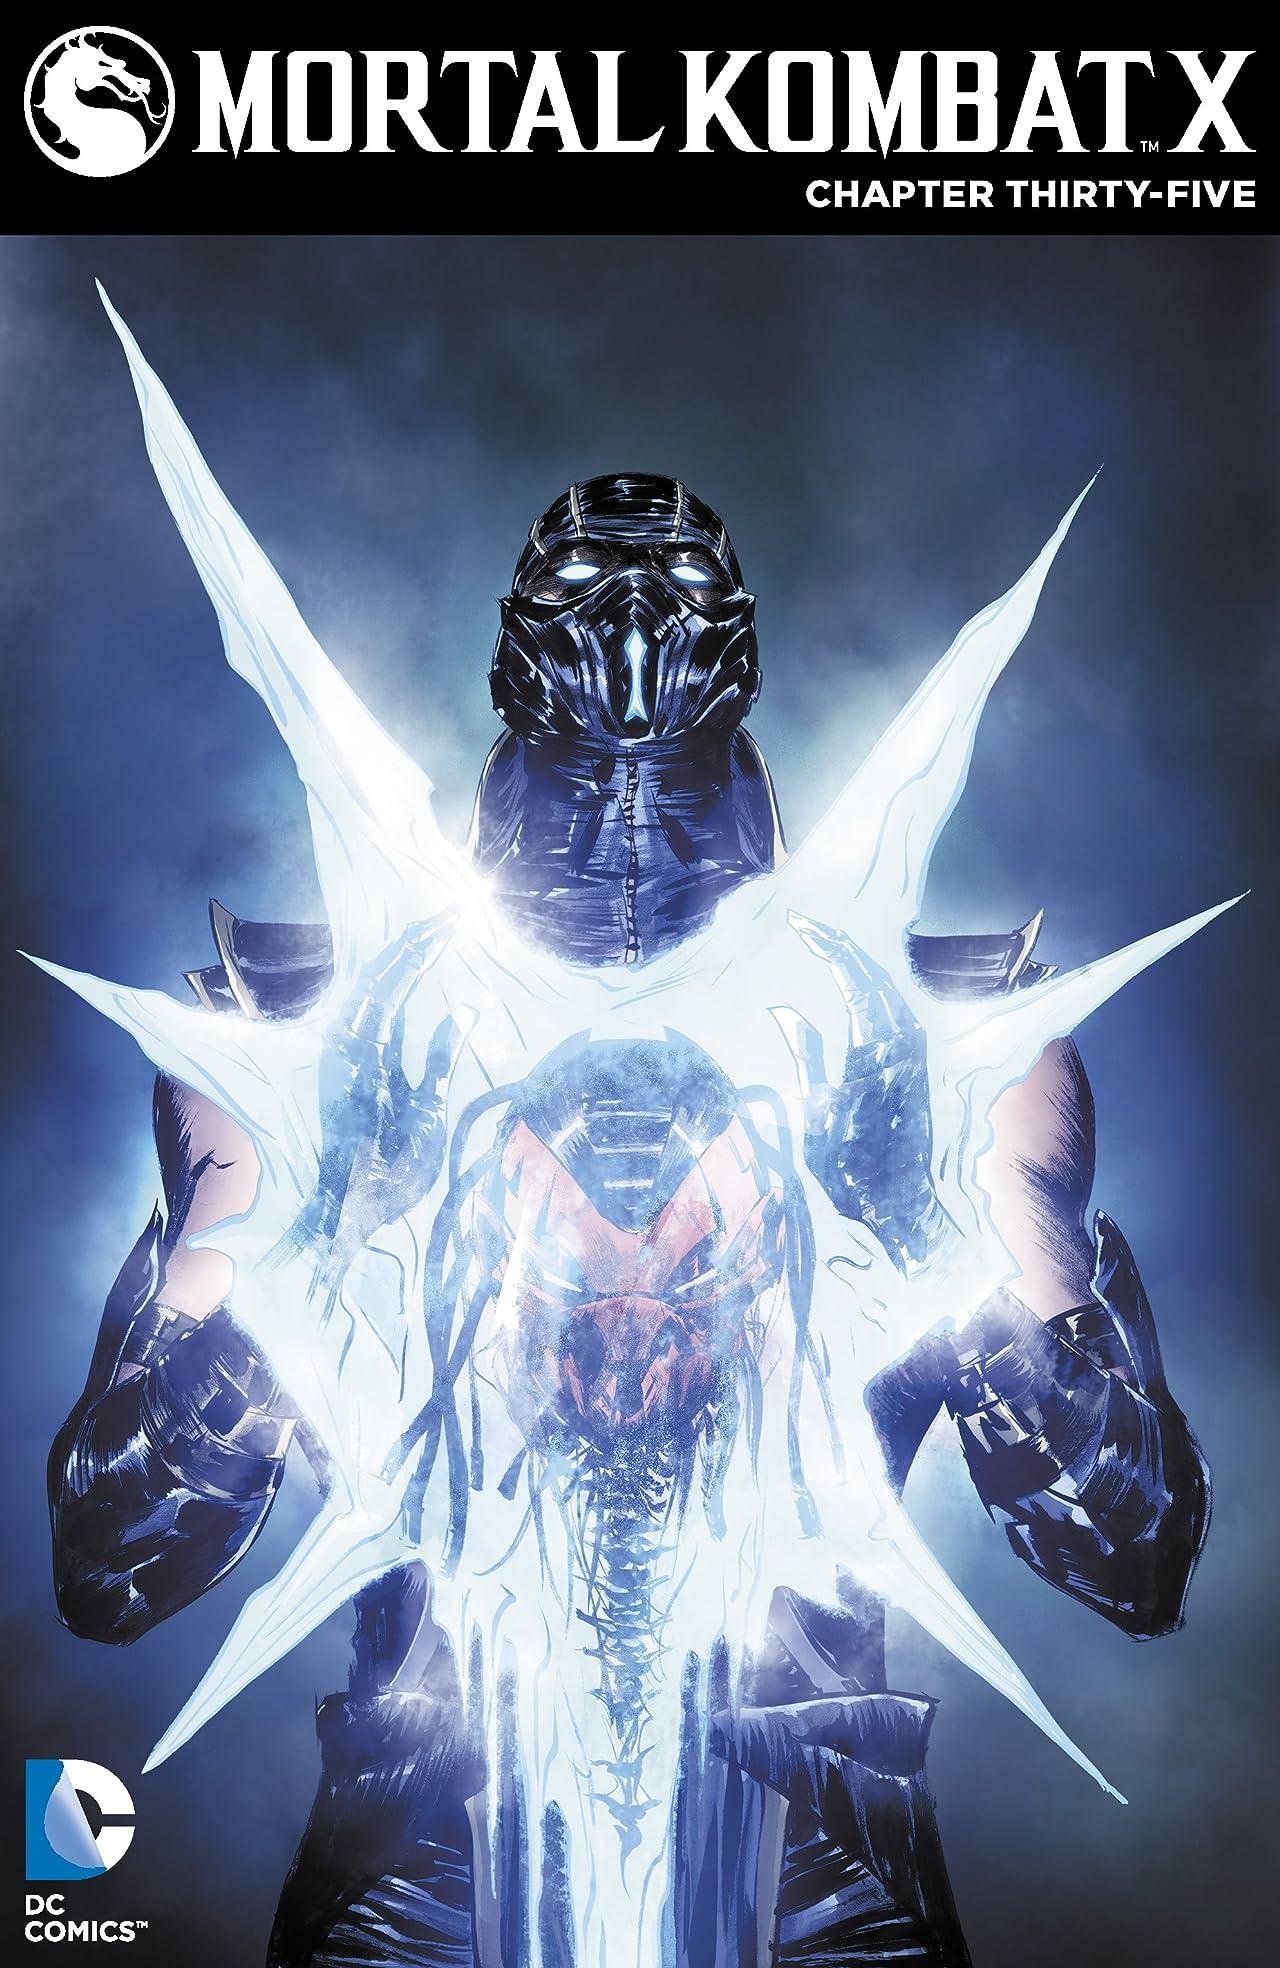 Mortal Kombat X (2015) #35